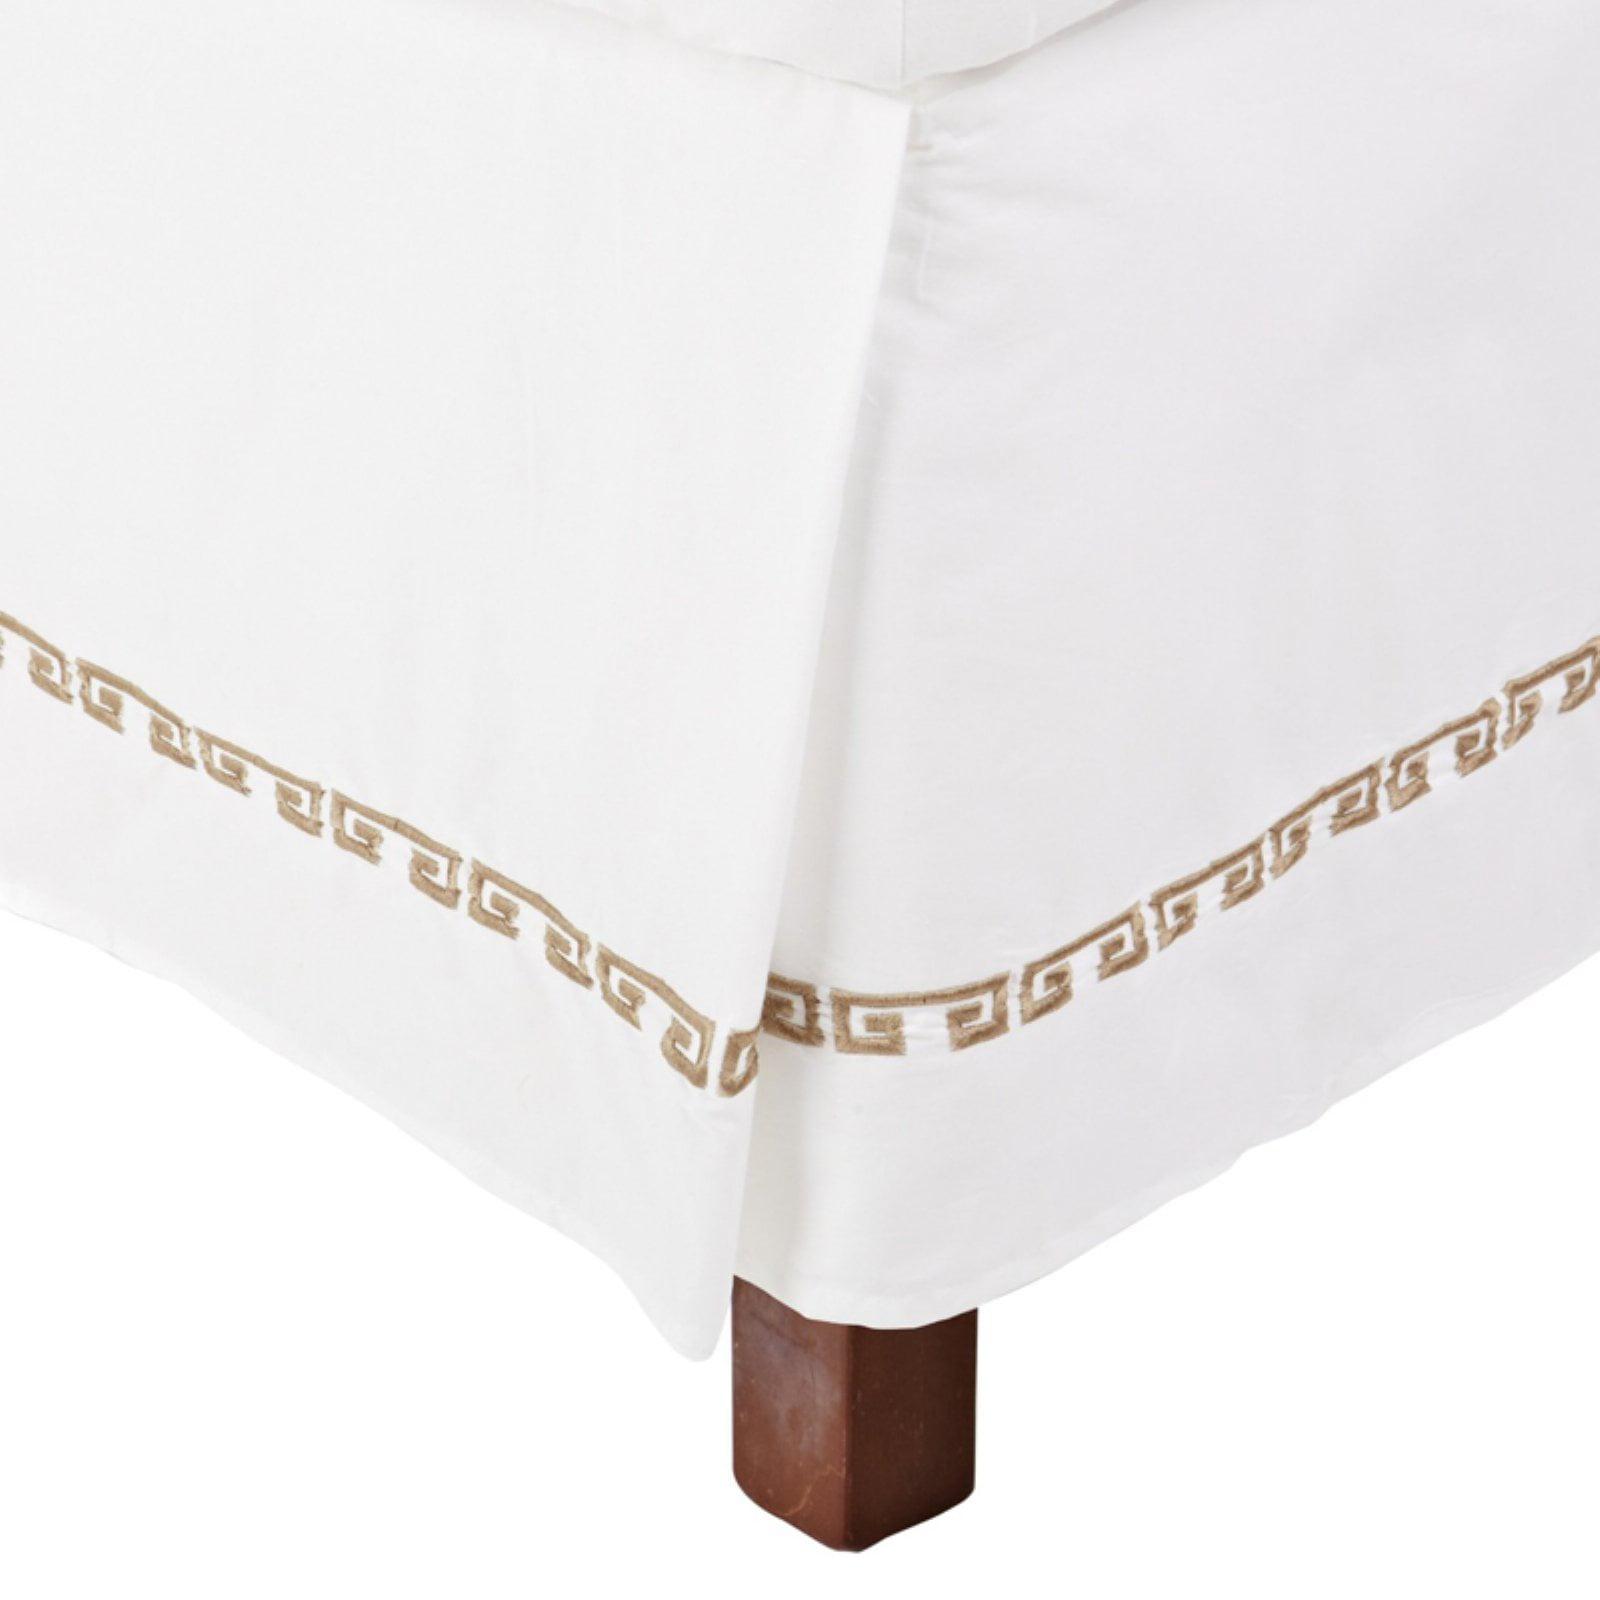 Superior Kendell Greek Border Cotton Bedskirt by Supplier Generic